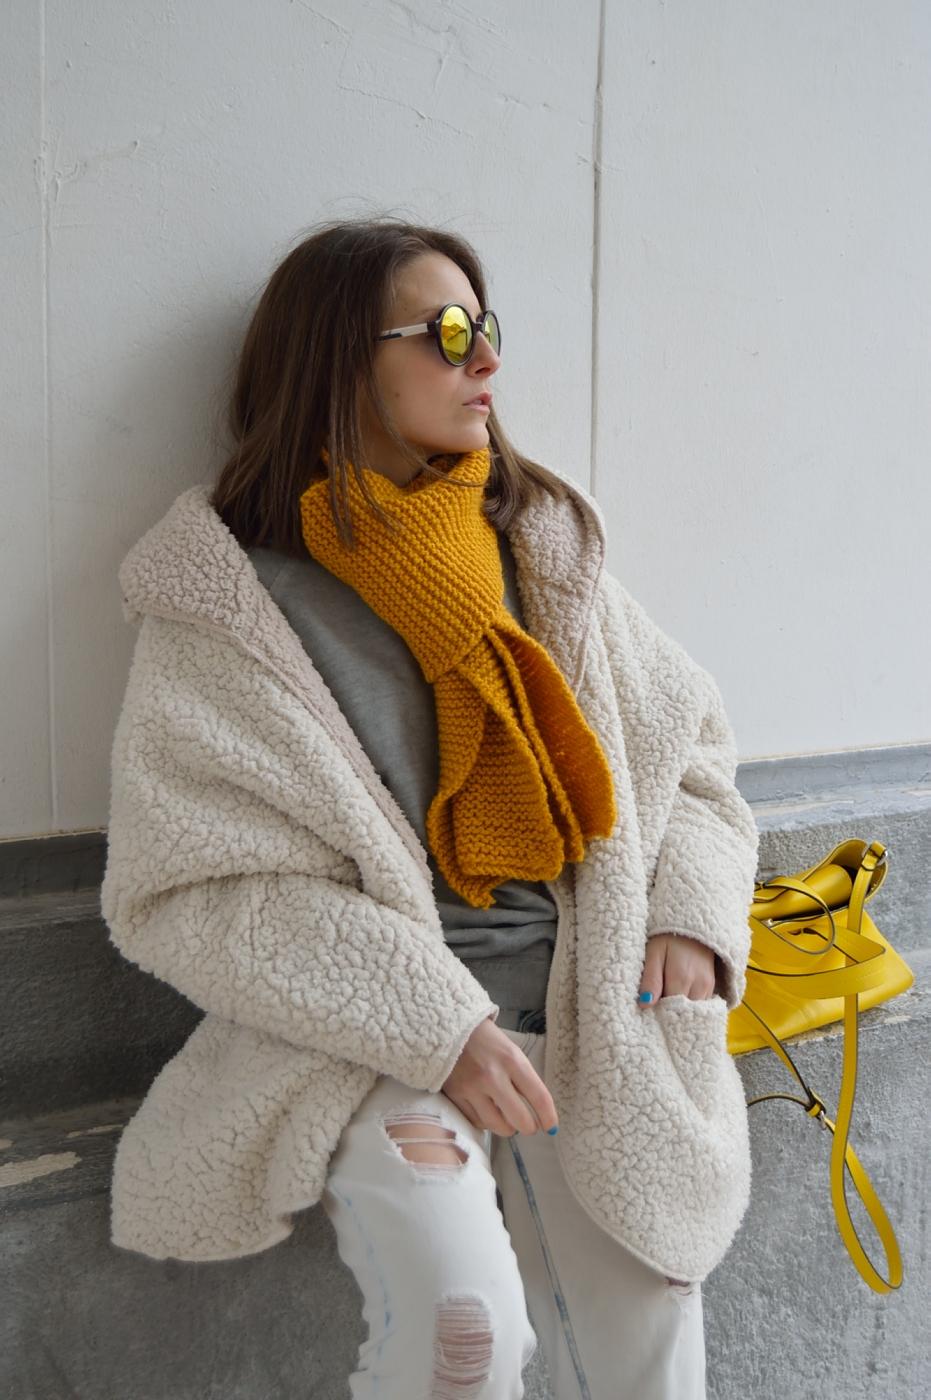 lara-vazquez-mad-lula-style-look-fashion-ootd